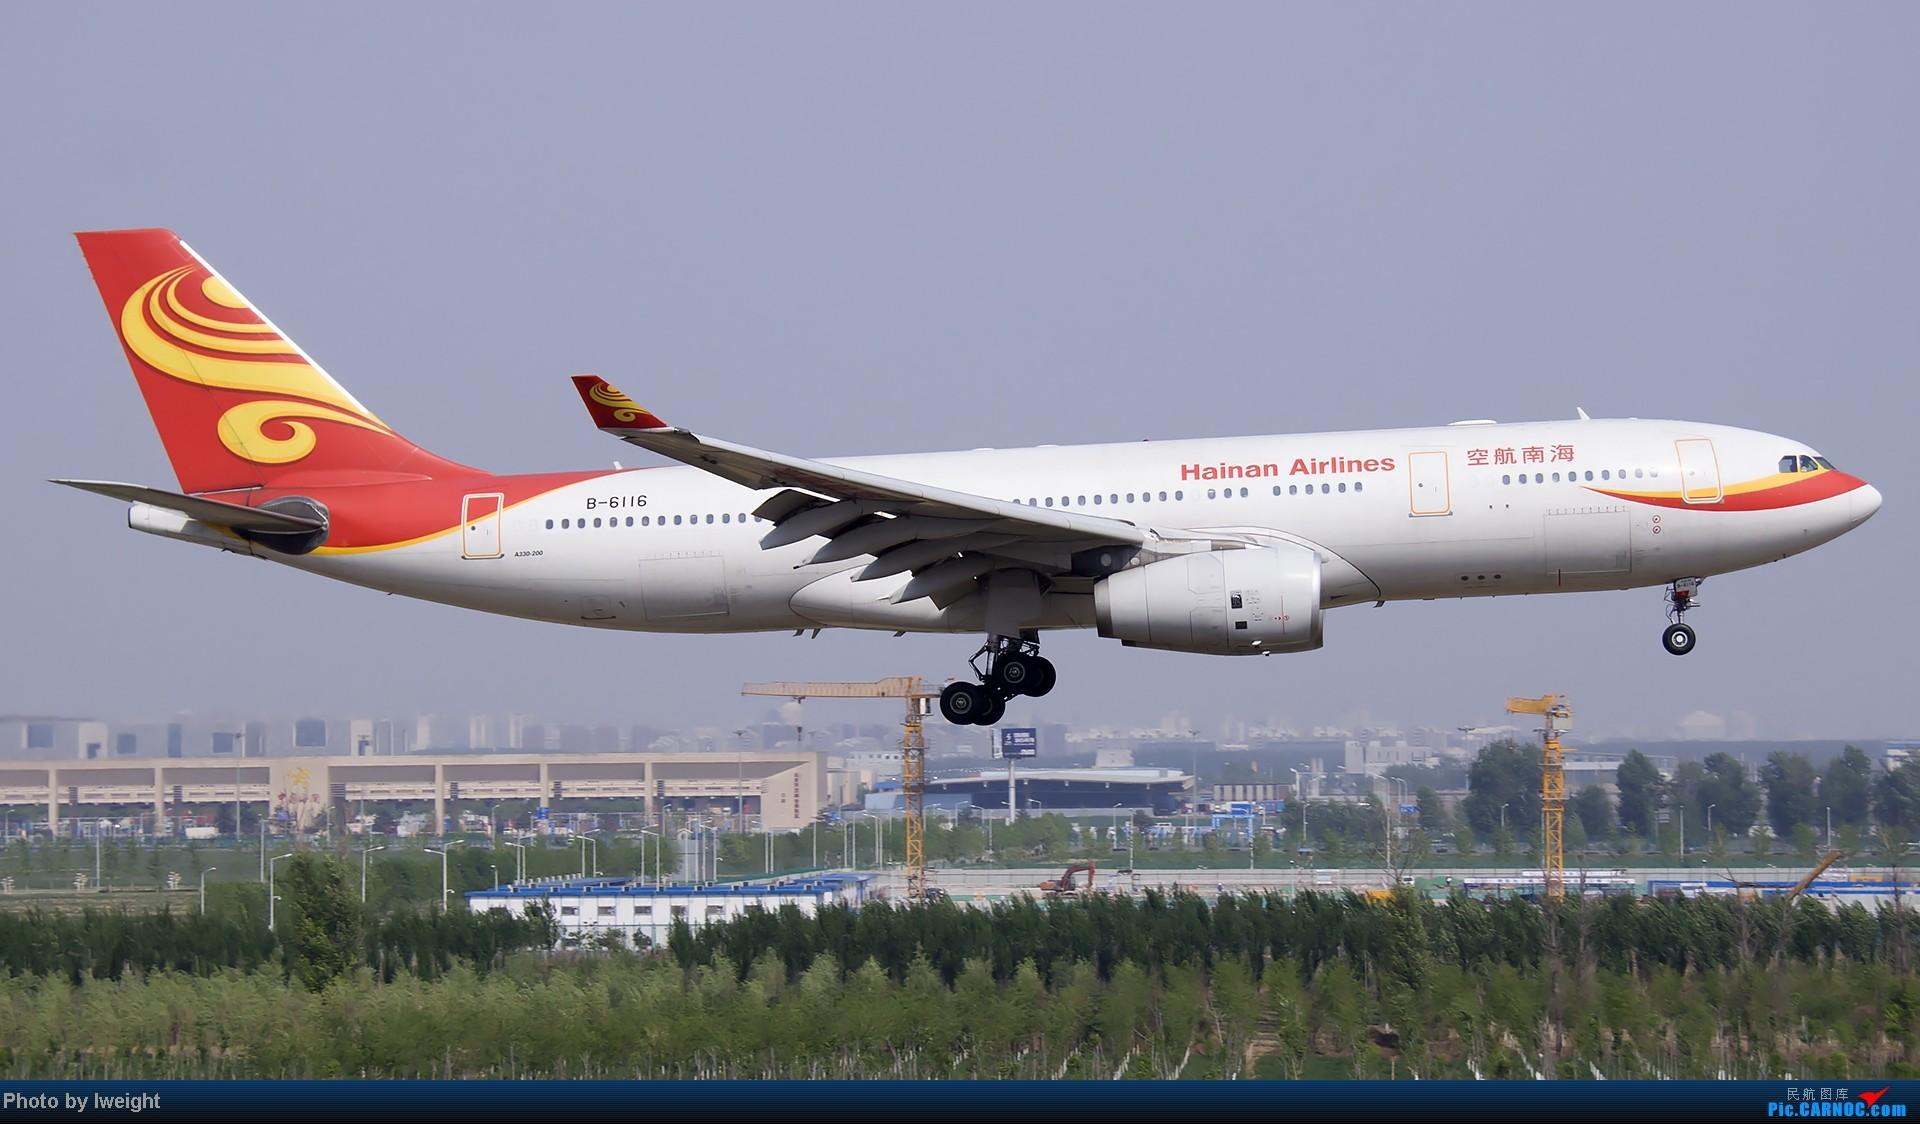 Re:[原创]错过了卡航的巴塞罗那号,只有这些大路货了,泪奔啊 AIRBUS A330-200 B-6116 中国北京首都机场